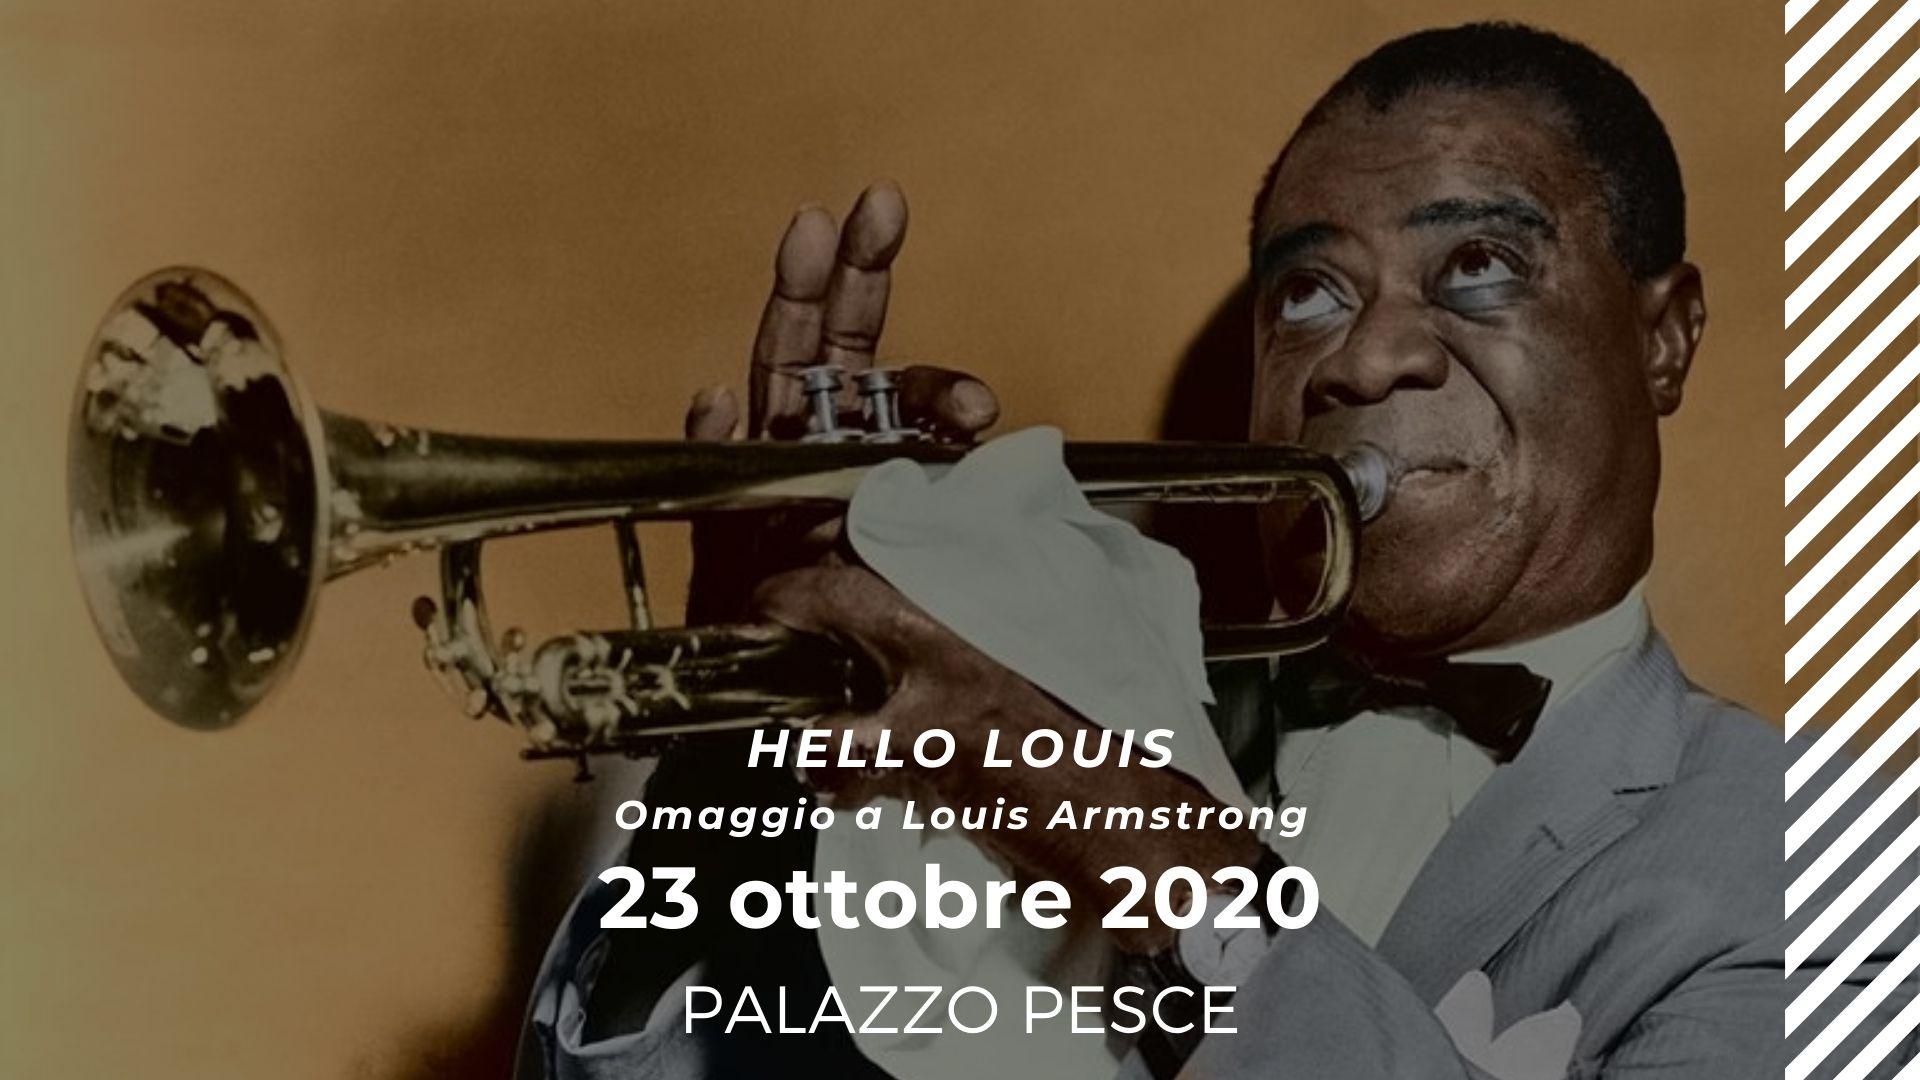 23 ottobre Hello Louis a Palazzo Pesce